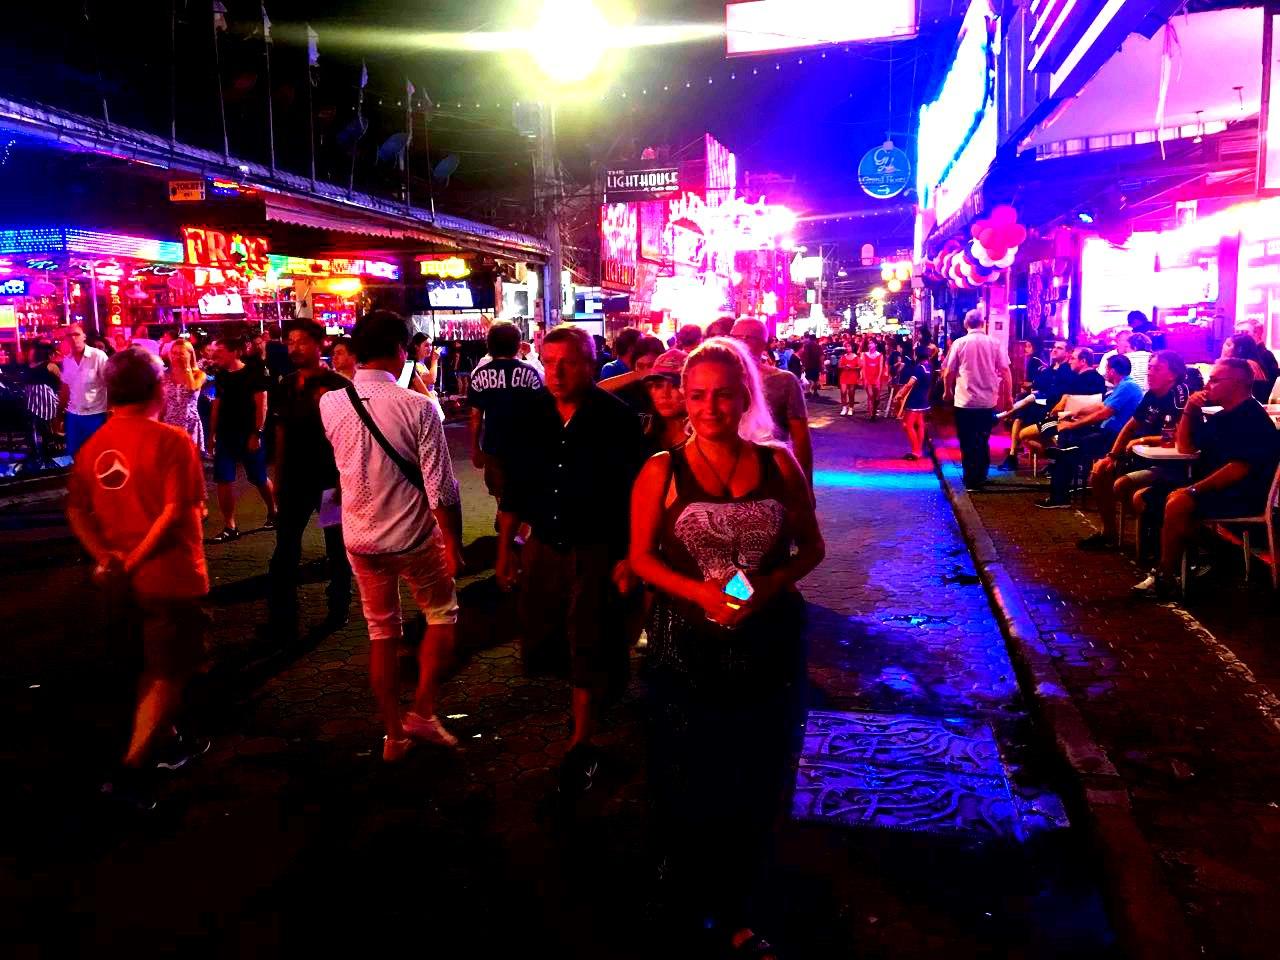 Елена Руденко (Валтея). Таиланд.  Фото и видео, а также мои впечатления, отзывы, советы и т.д. O43LdM_dQtg